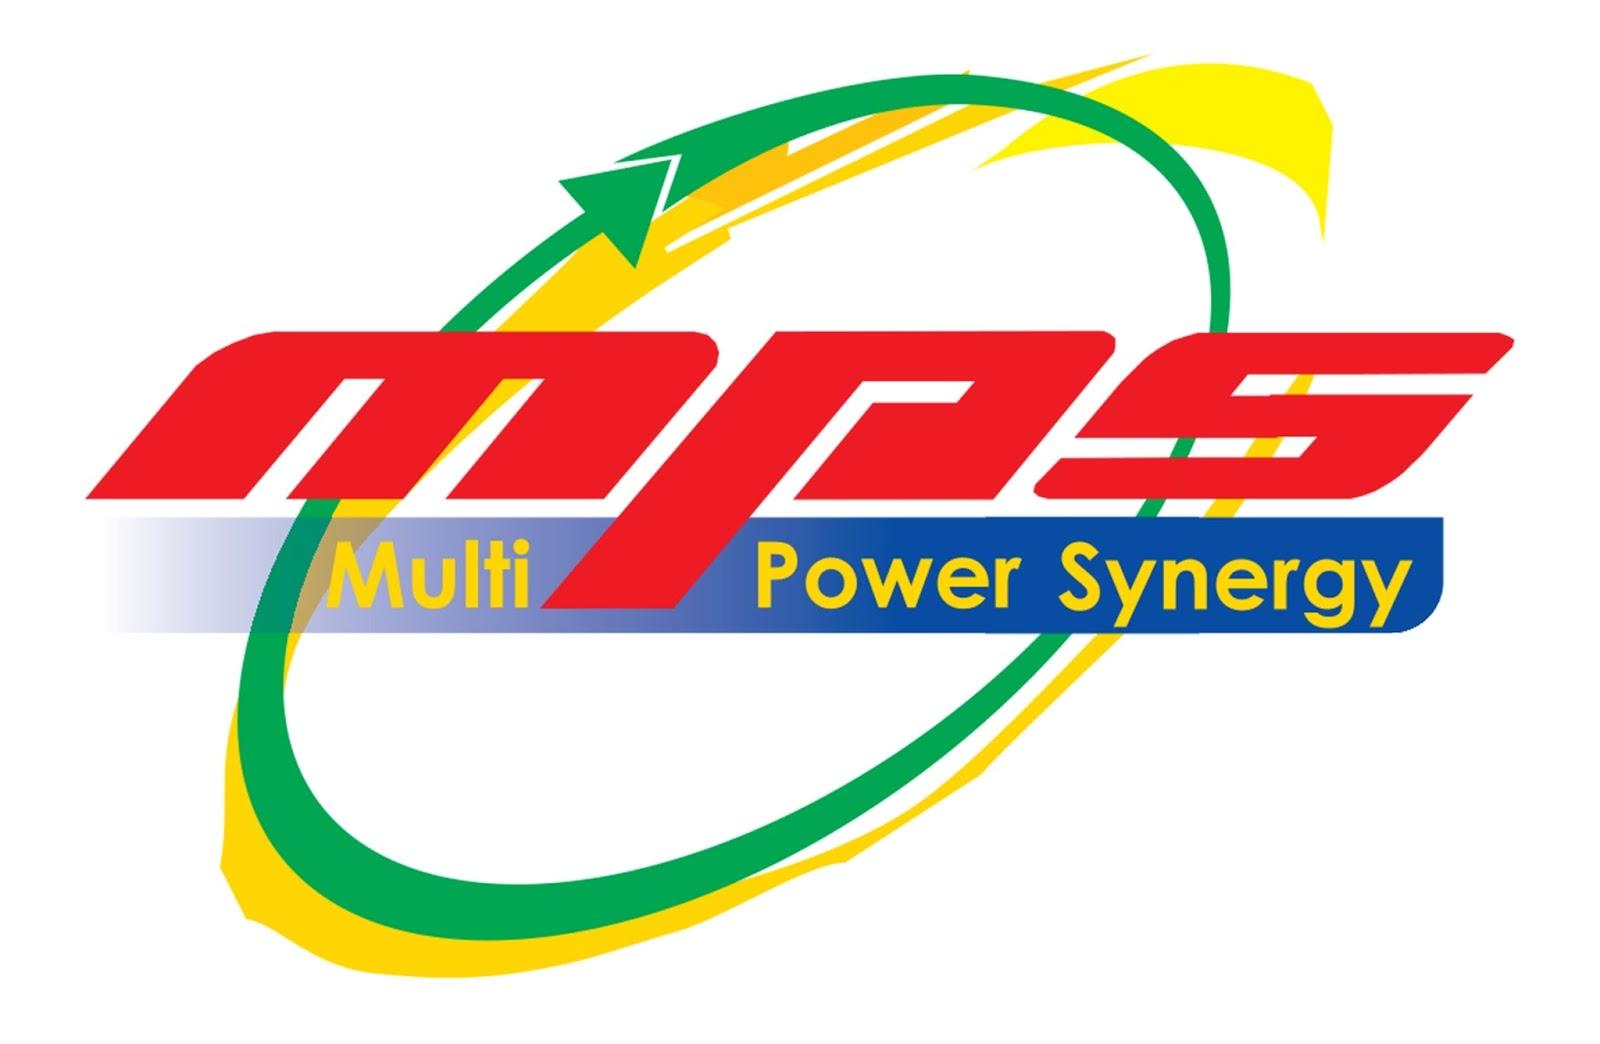 Lowongan Kerja di Multi Power Sinergy - Semarang